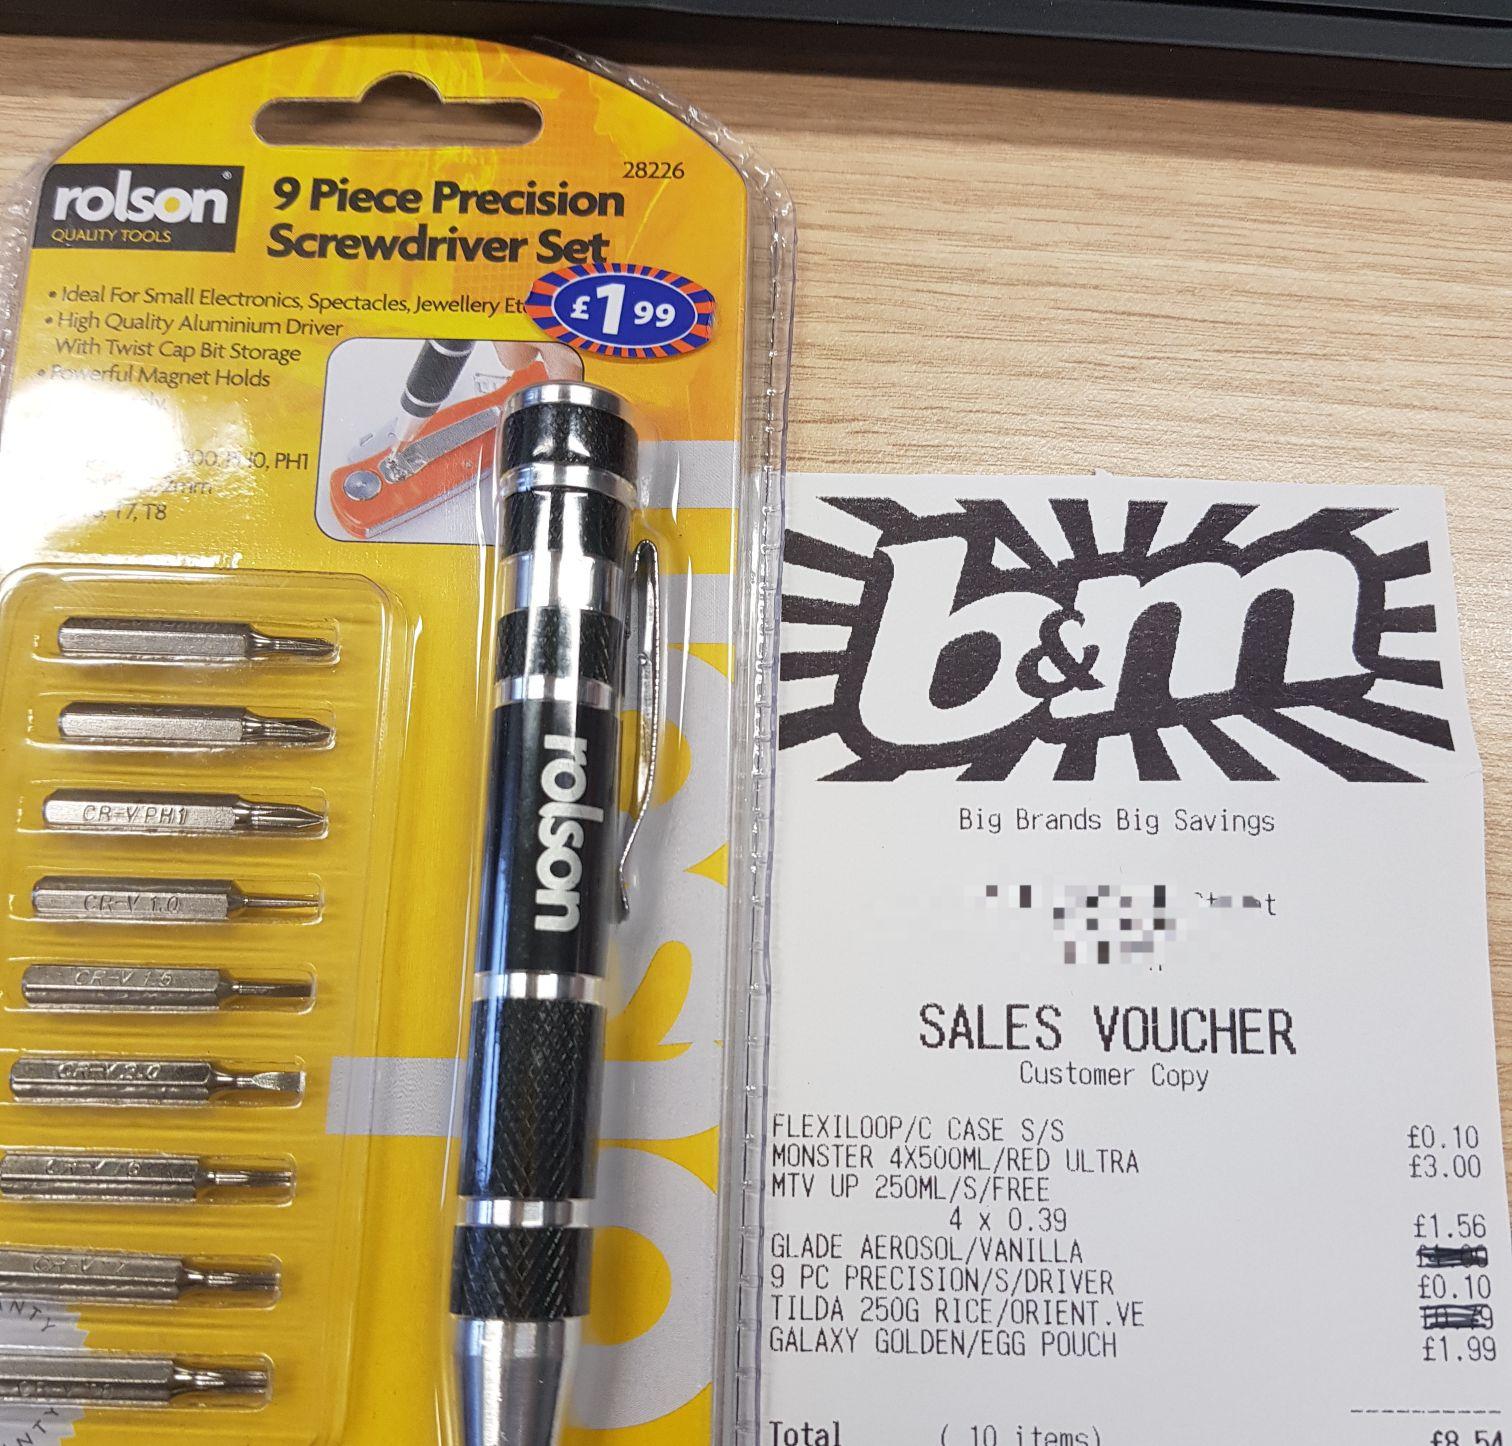 Rolson 9 Piece Precision Screwdriver Set 10 10p @ B&M